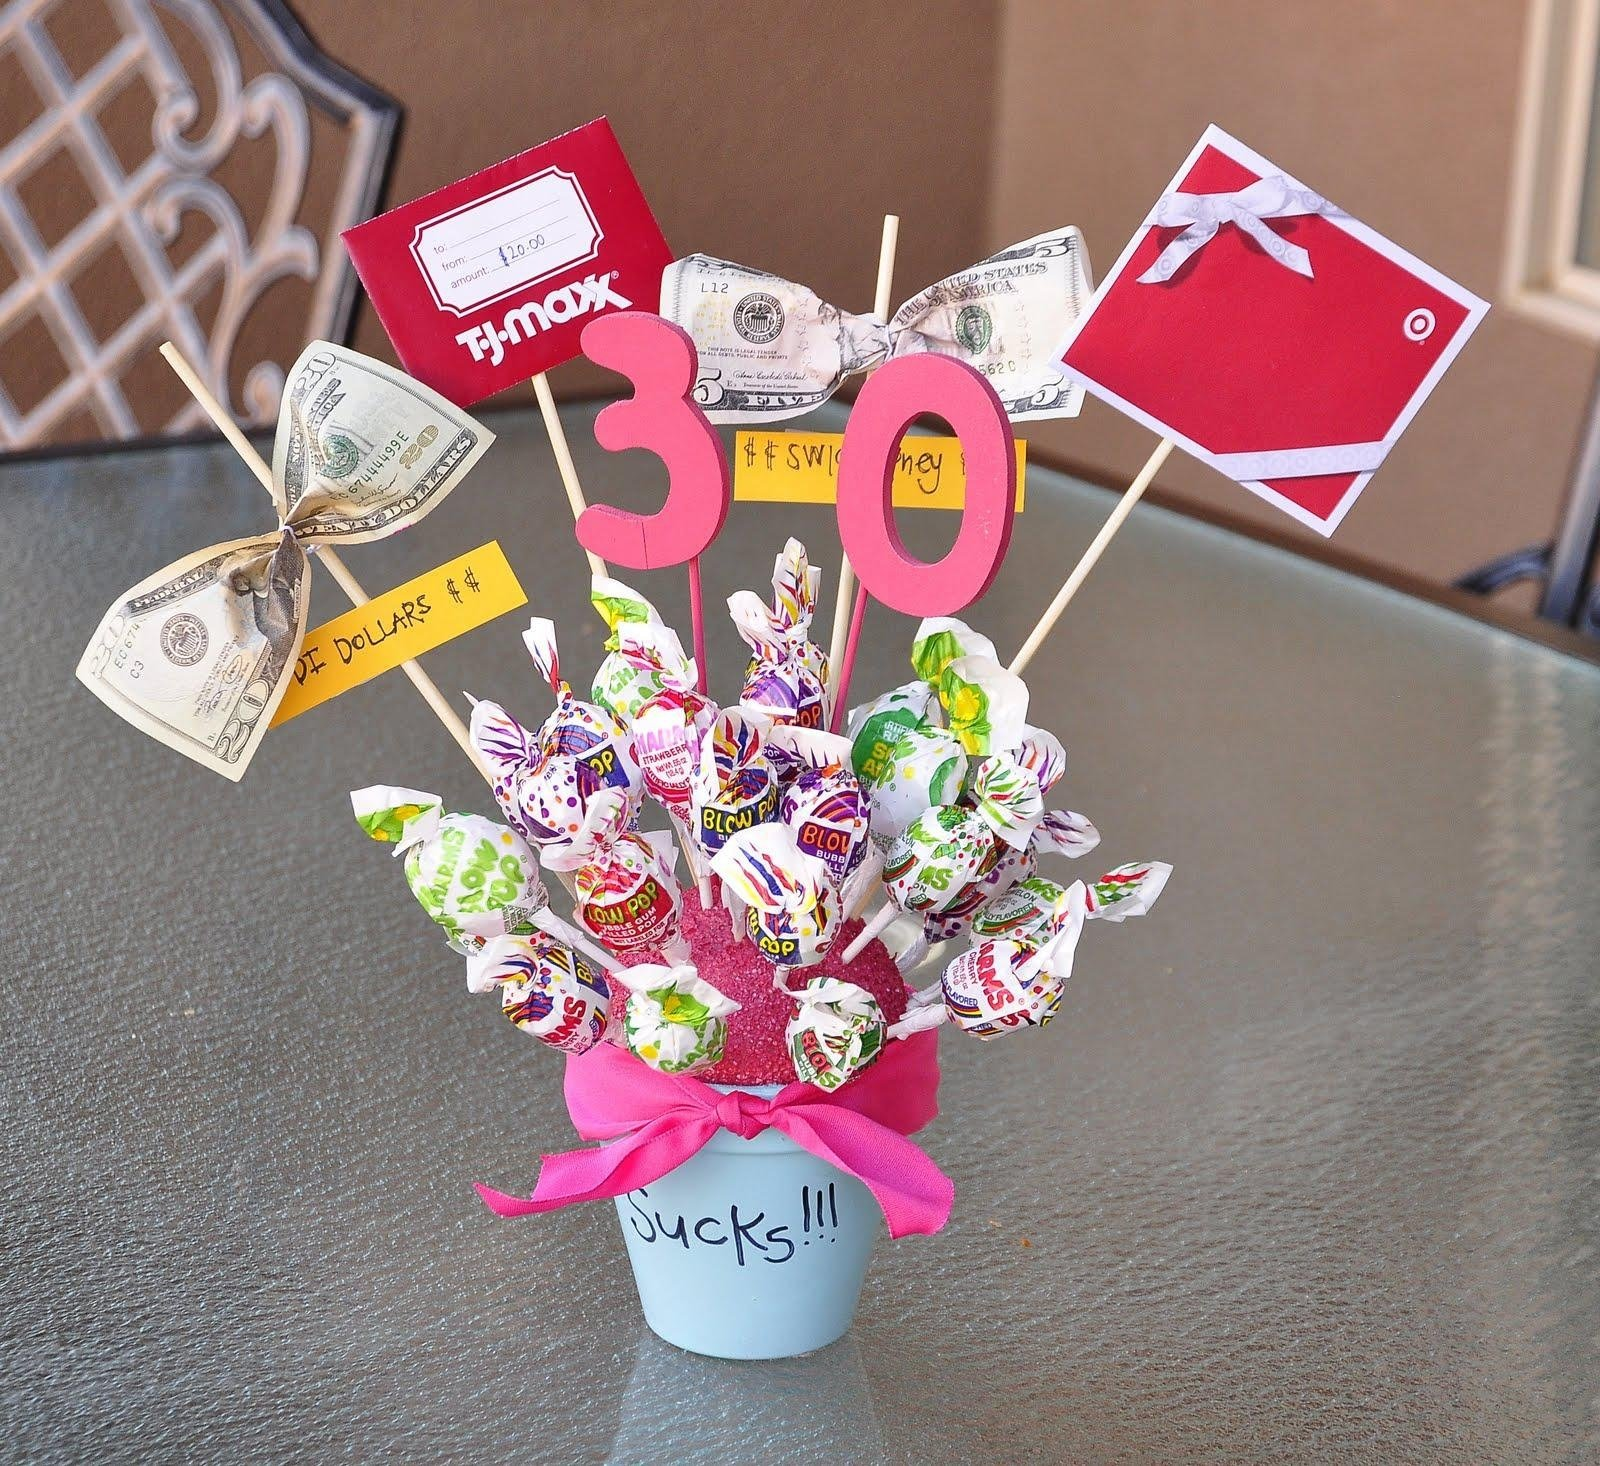 10 Amazing Birthday Ideas For A Friend diy birthday gift ideas for your best friend female birthday party